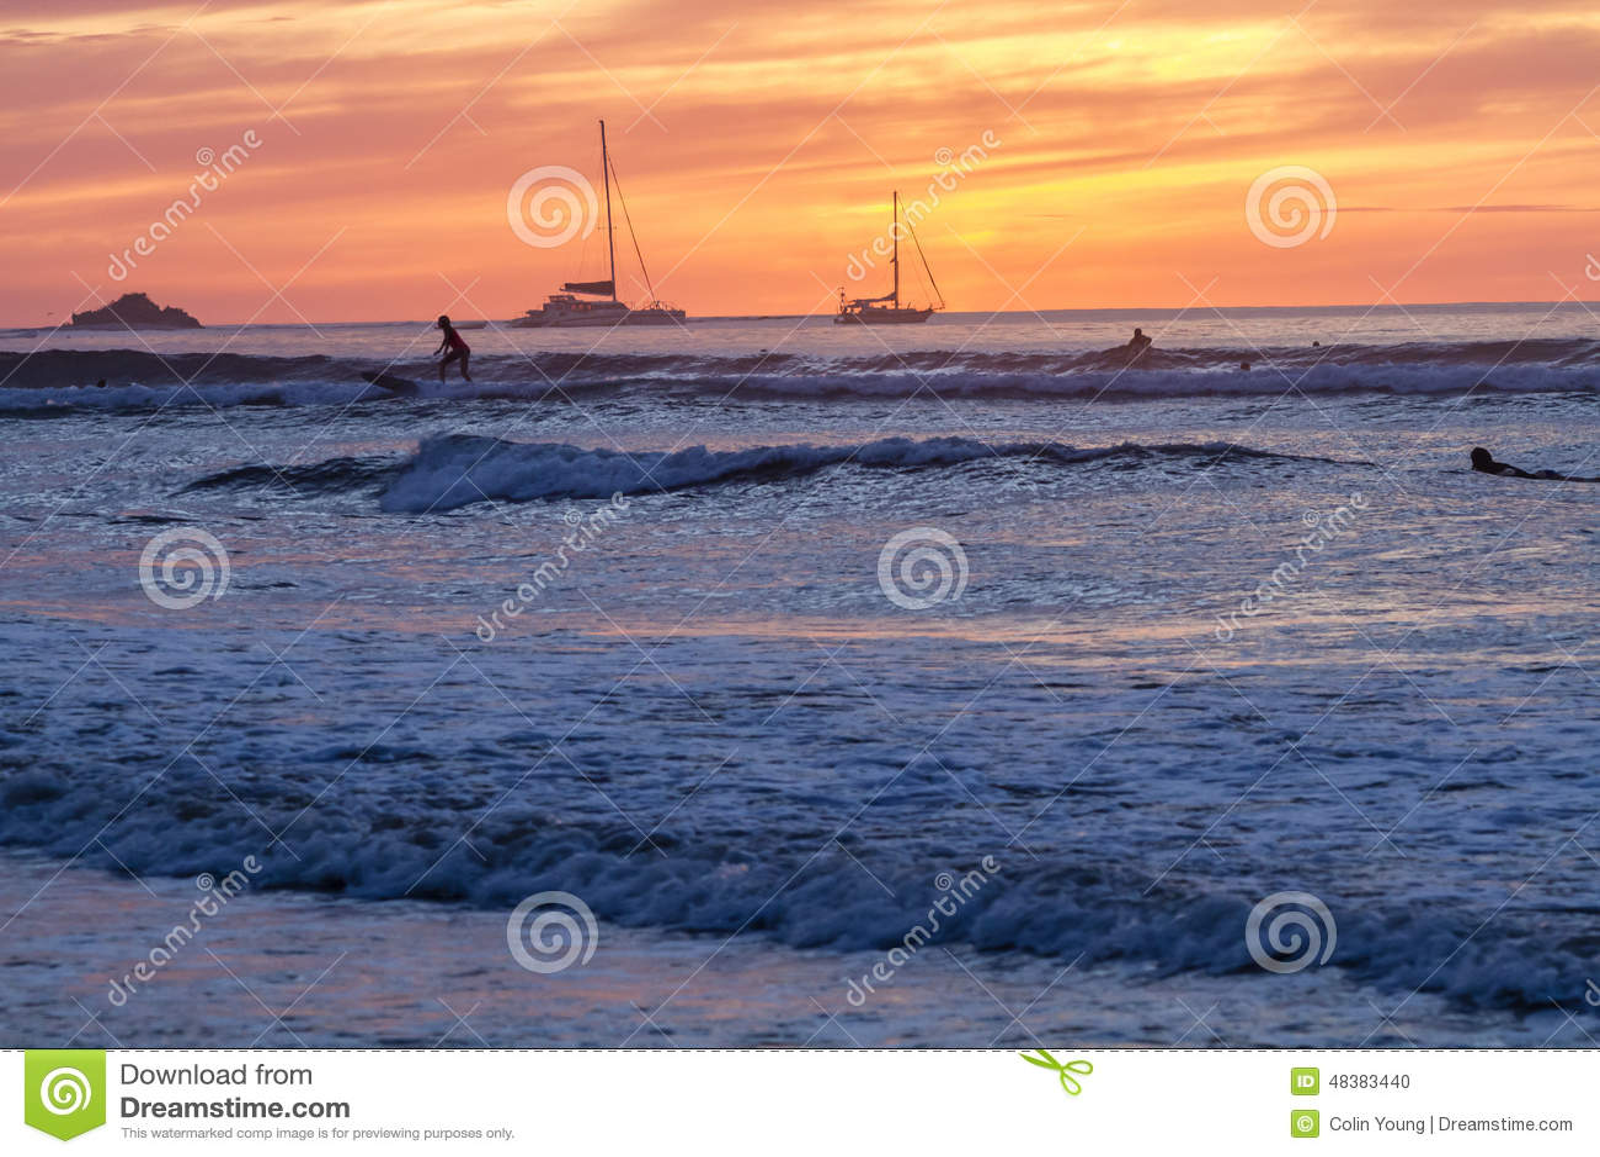 Tamarindo que surfa no por do sol